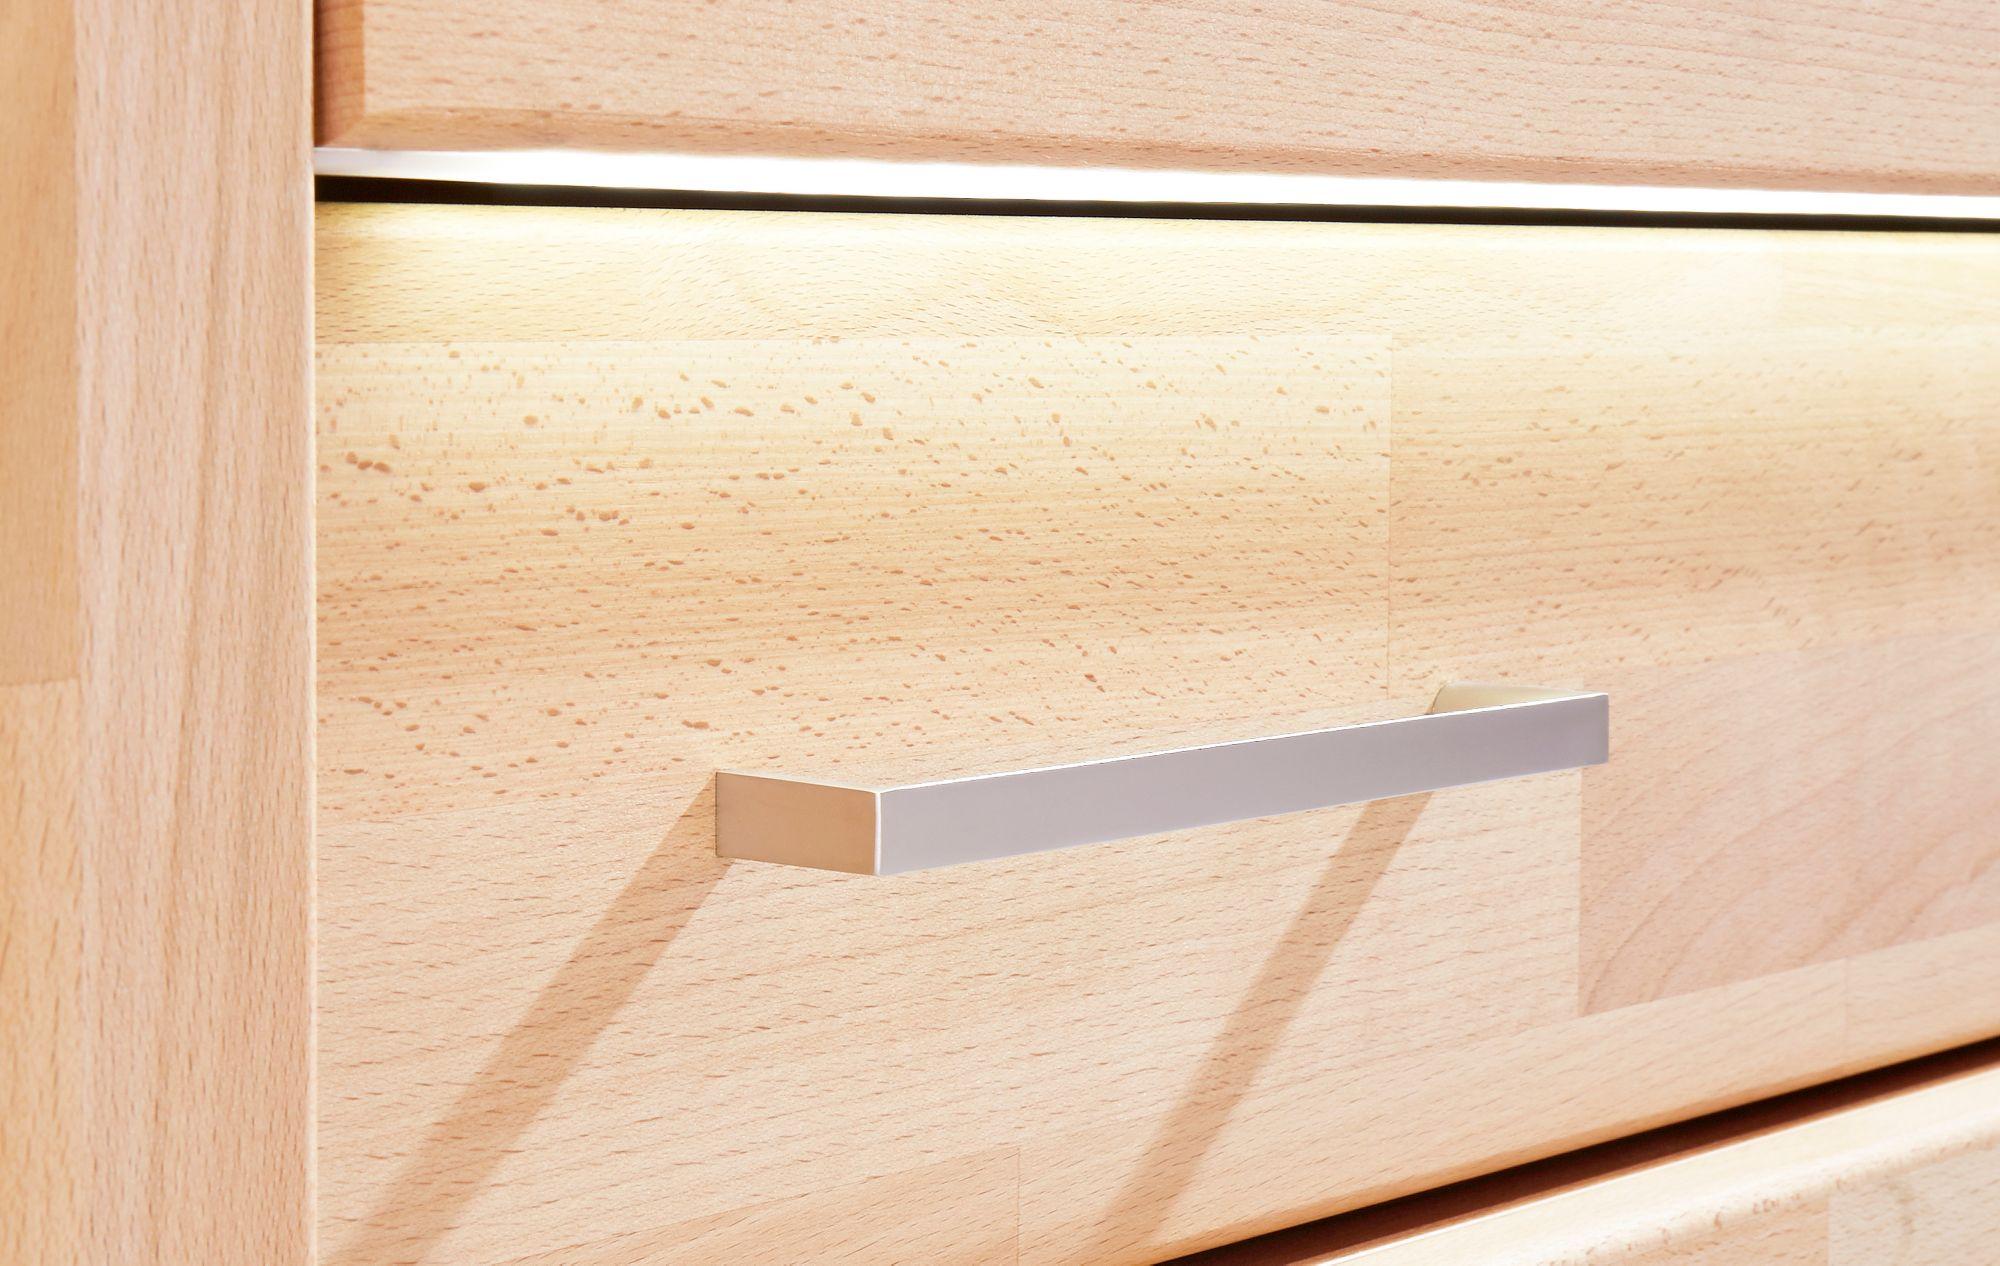 led beleuchtungsleiste schwab versand schrankleuchten. Black Bedroom Furniture Sets. Home Design Ideas